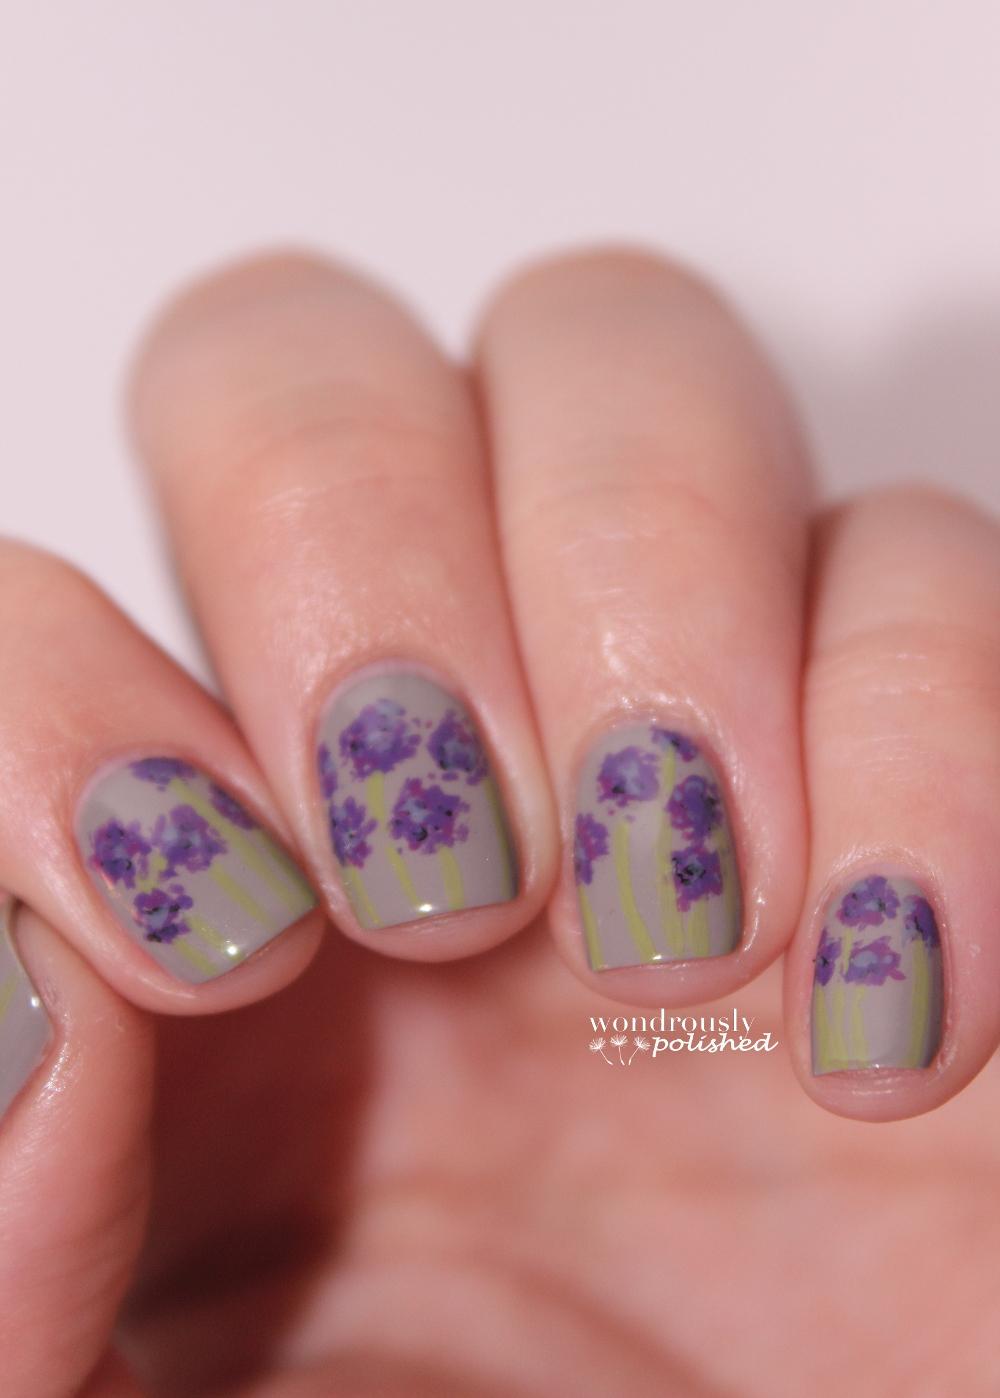 Wondrously Polished April Nail Art Challenge: Wondrously Polished: 30 Day Flower Challenge